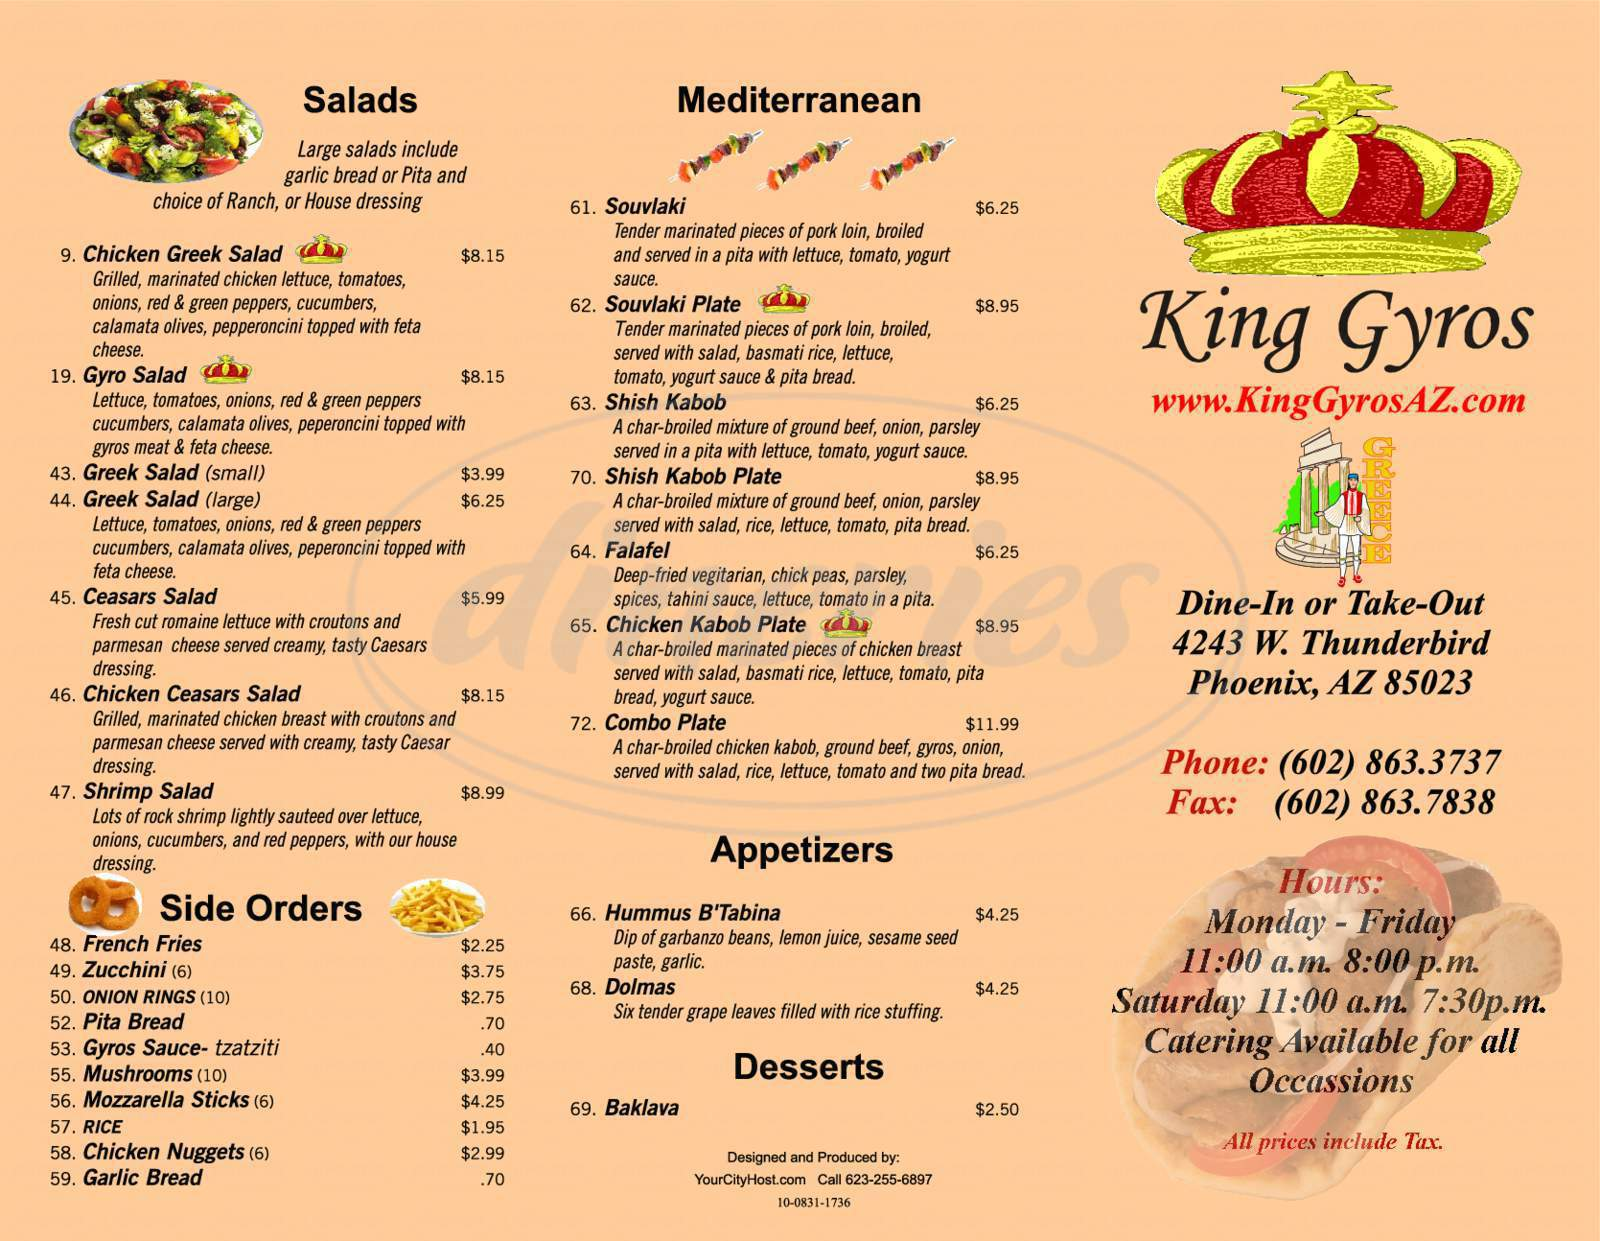 menu for King Gyros